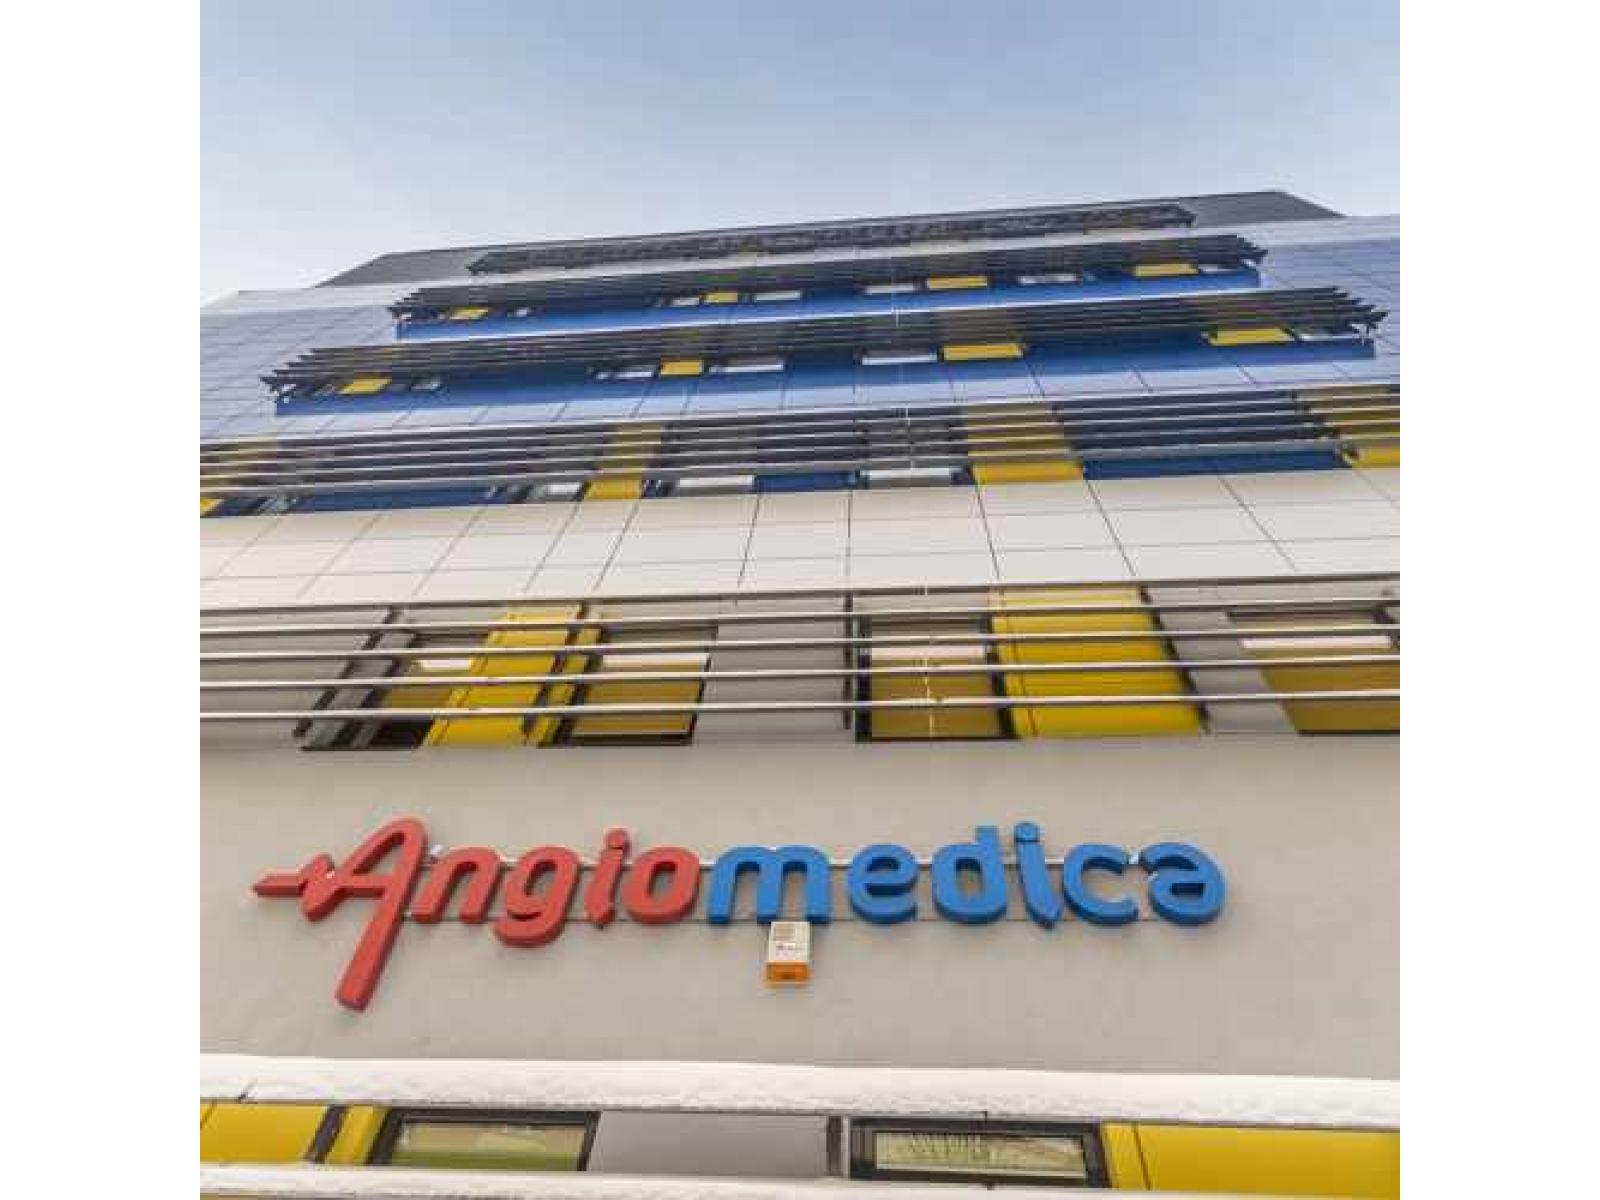 Spitalul de Boli Cardiovasculare Angiomedica - angio_bun.png